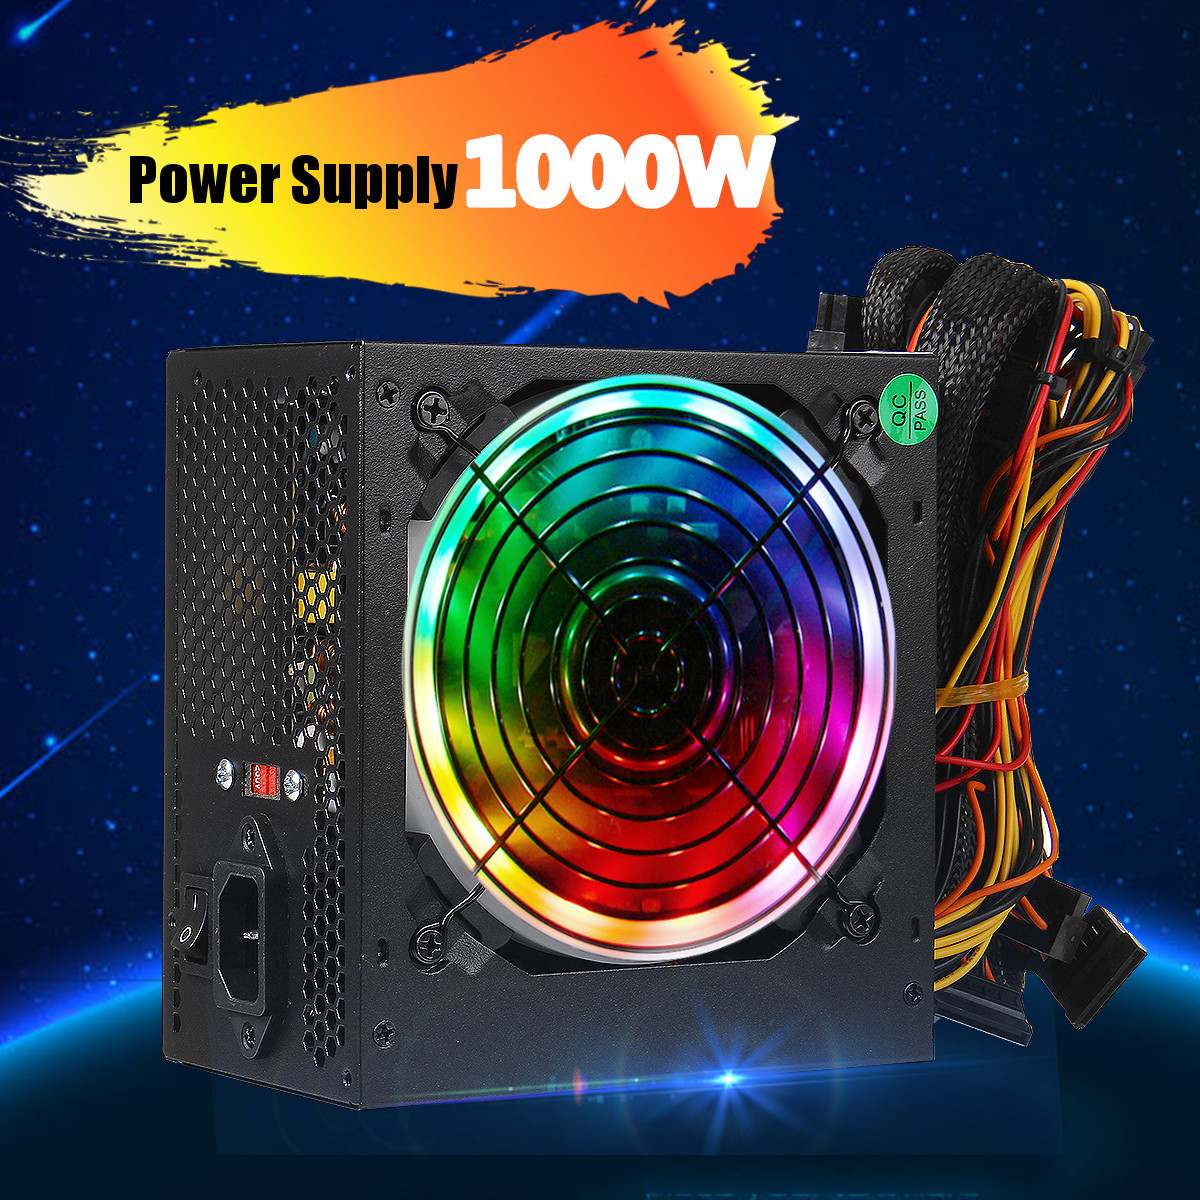 1000W 115~230V Power Supply PSU PFC 12cm LED Silent Fan ATX 24pin 12V PC Computer SATA Gaming Supply For Intel AMD Desktop